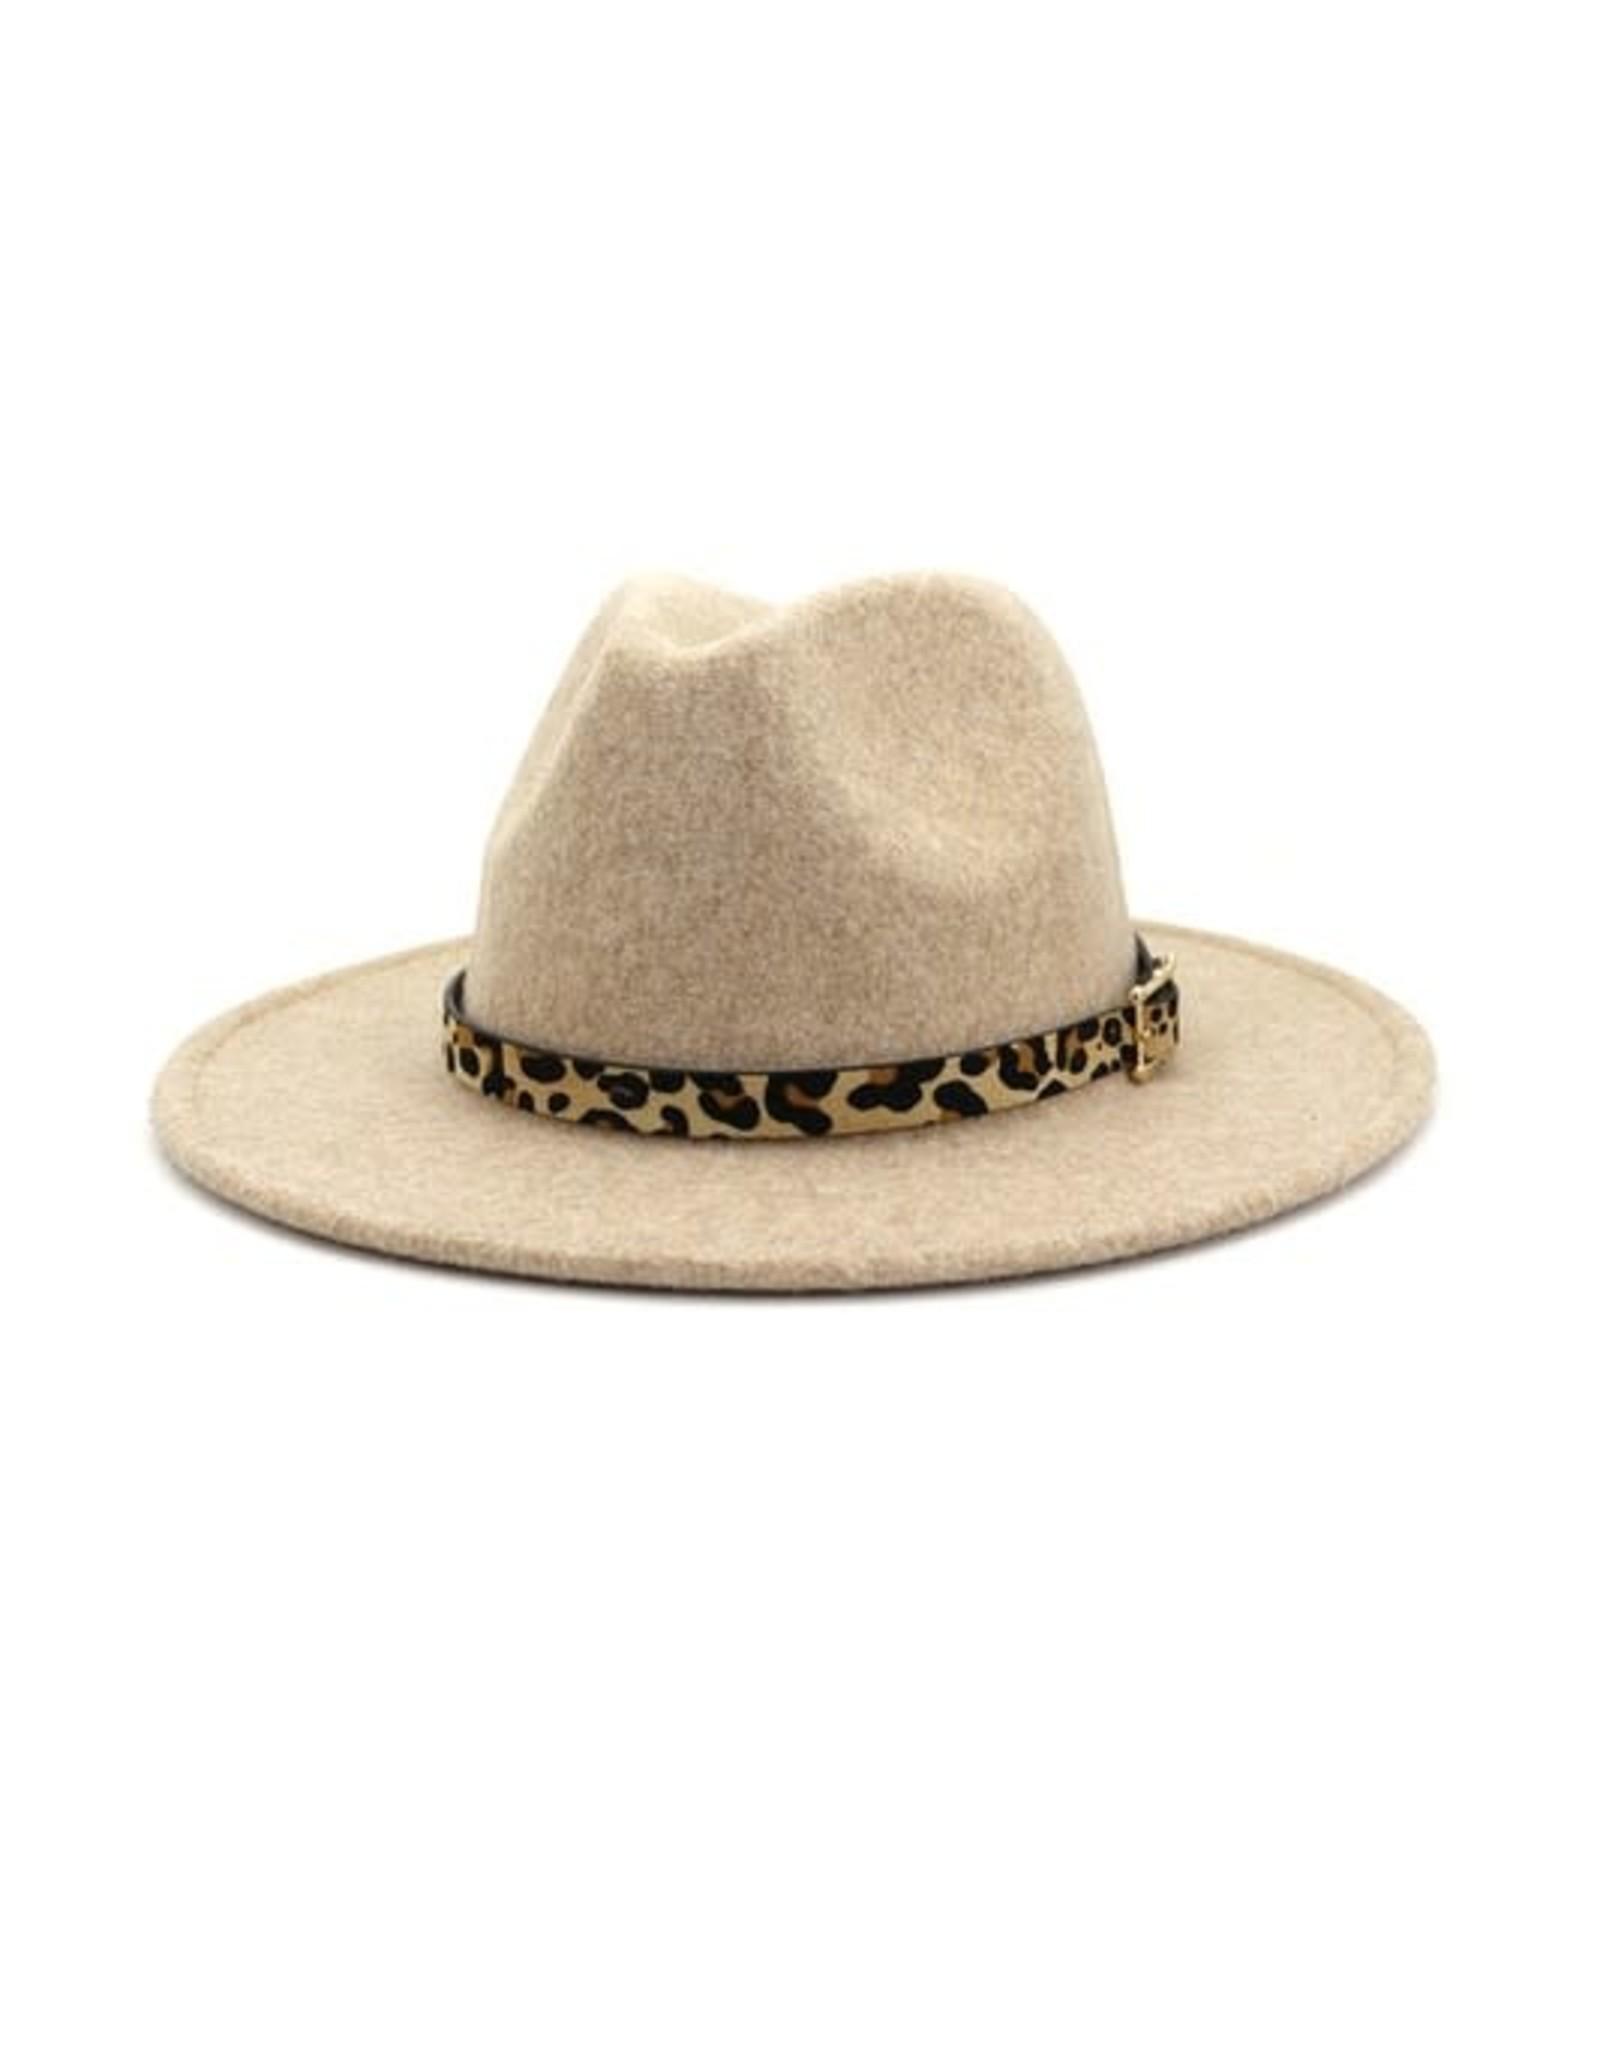 Wink Flat Brim Hat with Leopard Print Hat Band